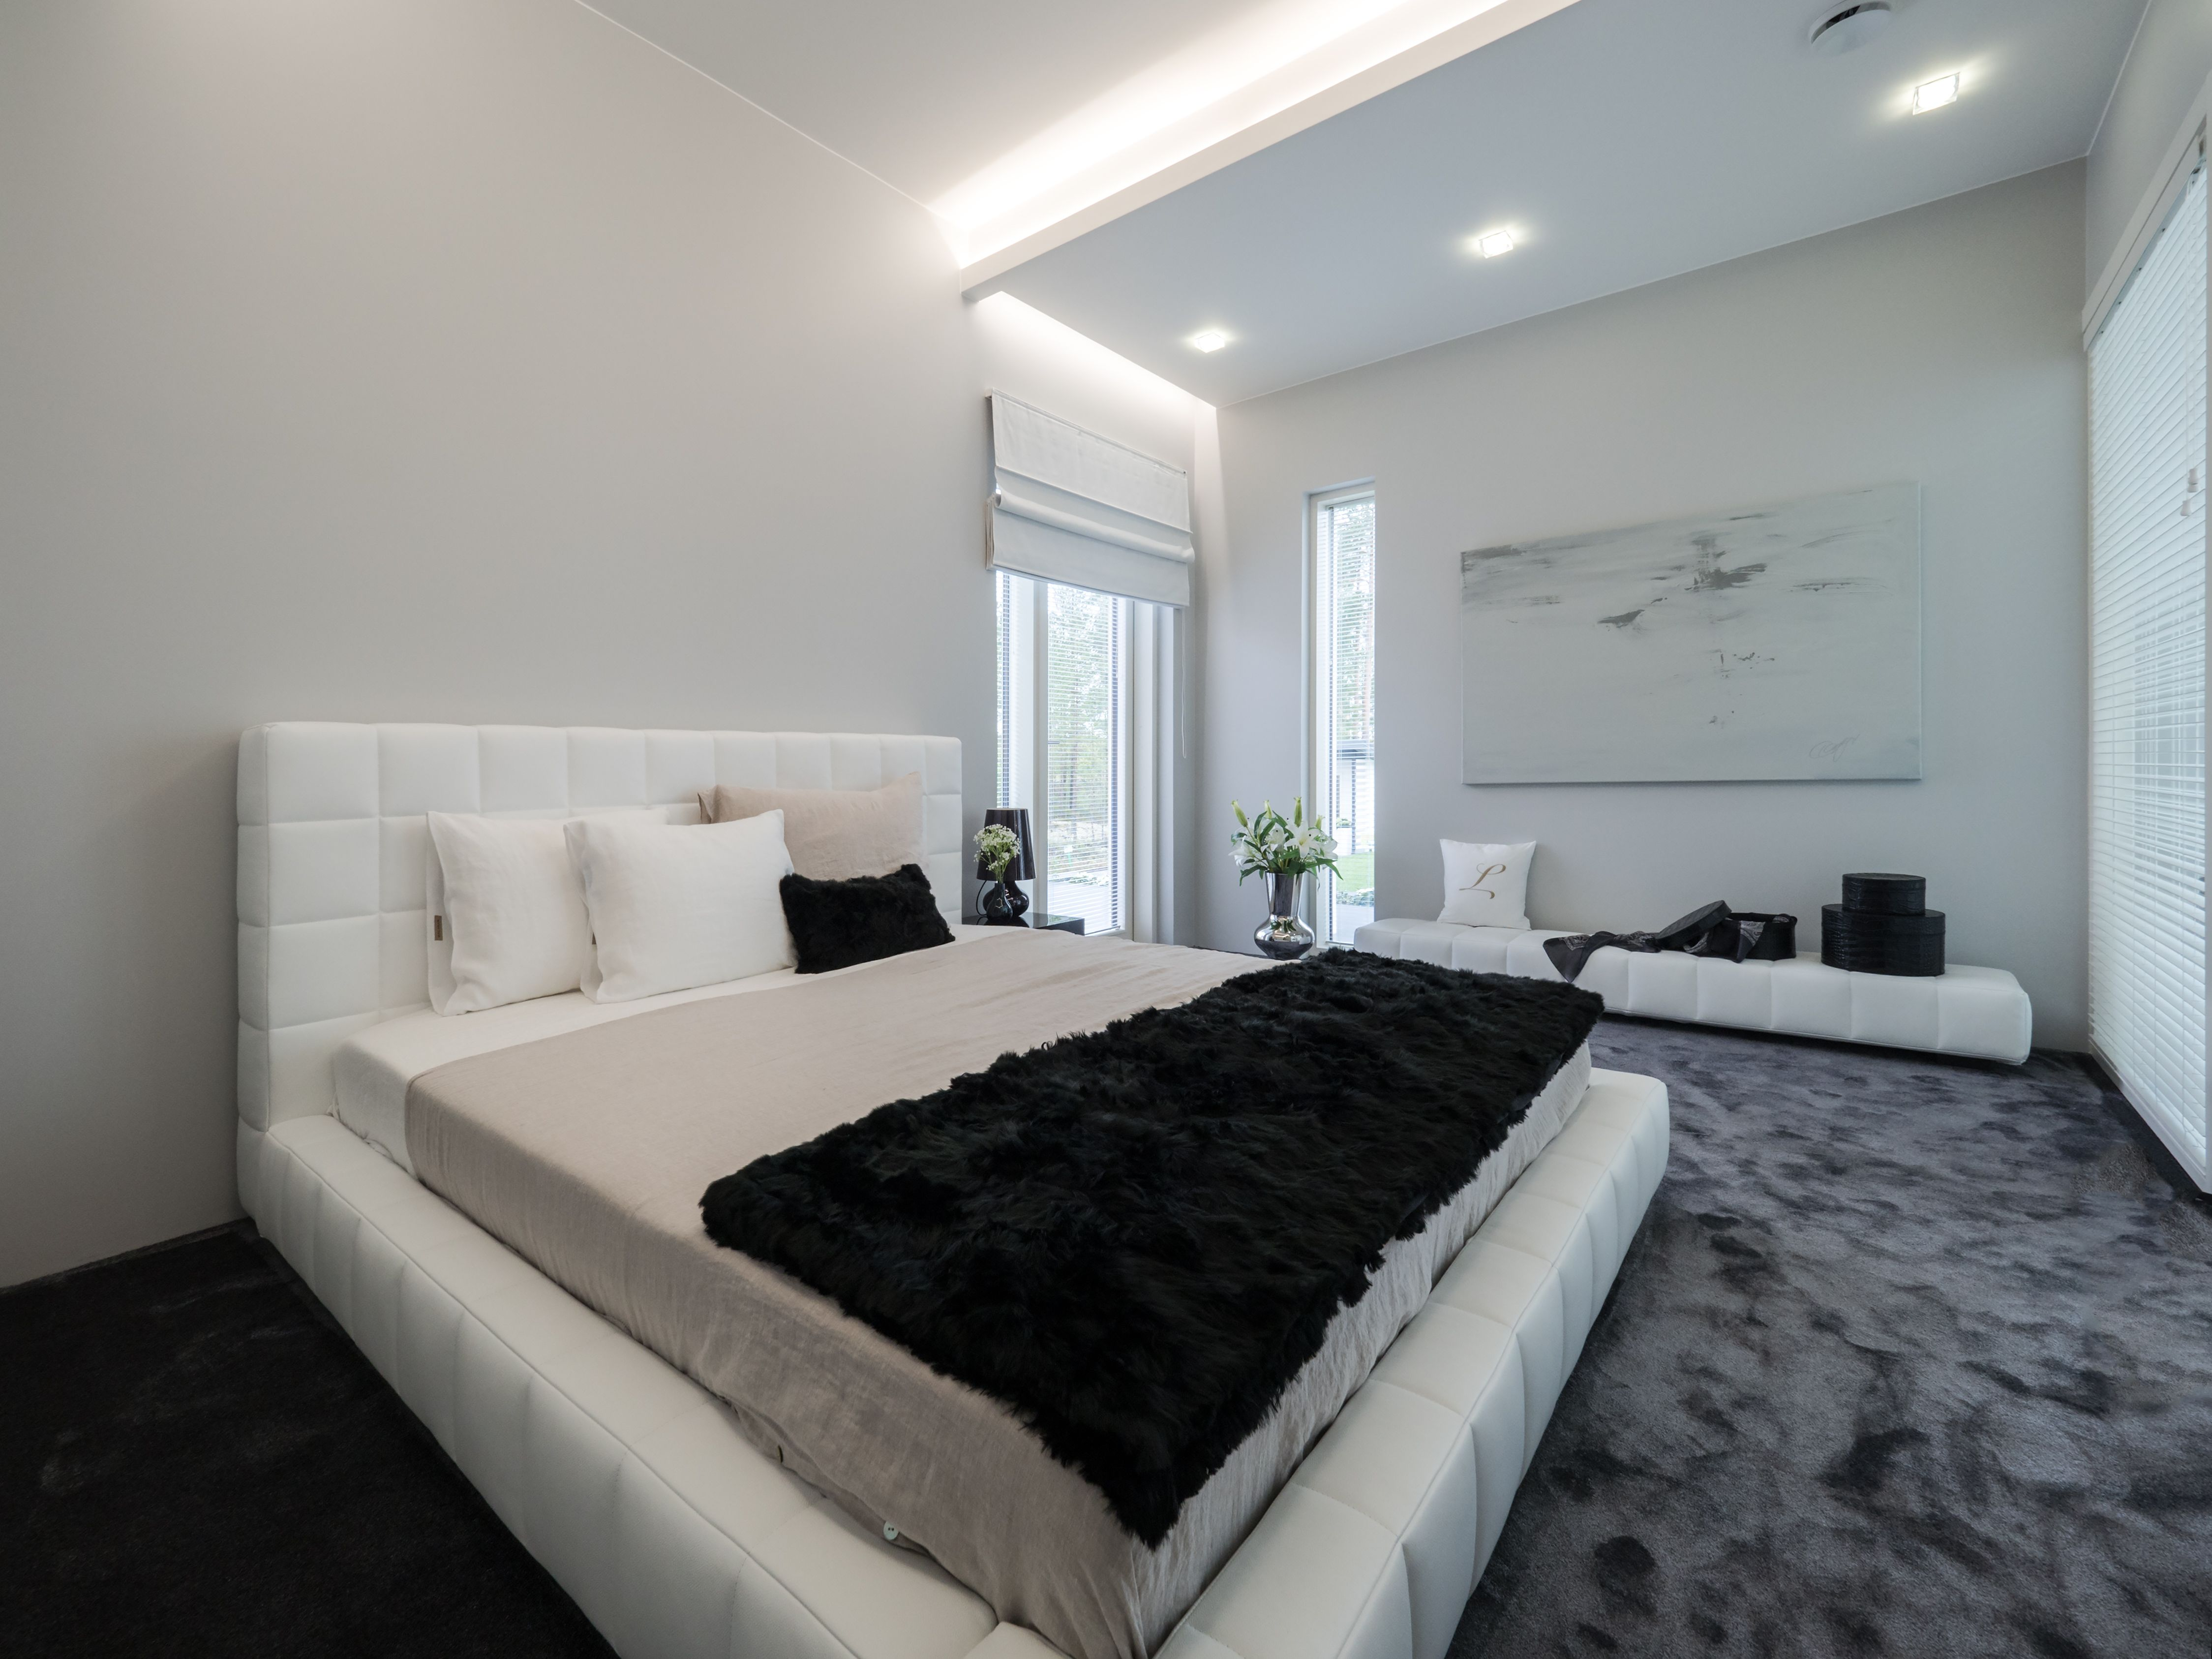 Stunning lighting brings this bedroom to life. Mahtavasti suunniteltu valaistusratkaisu tuo makuuhuoneen eloon.